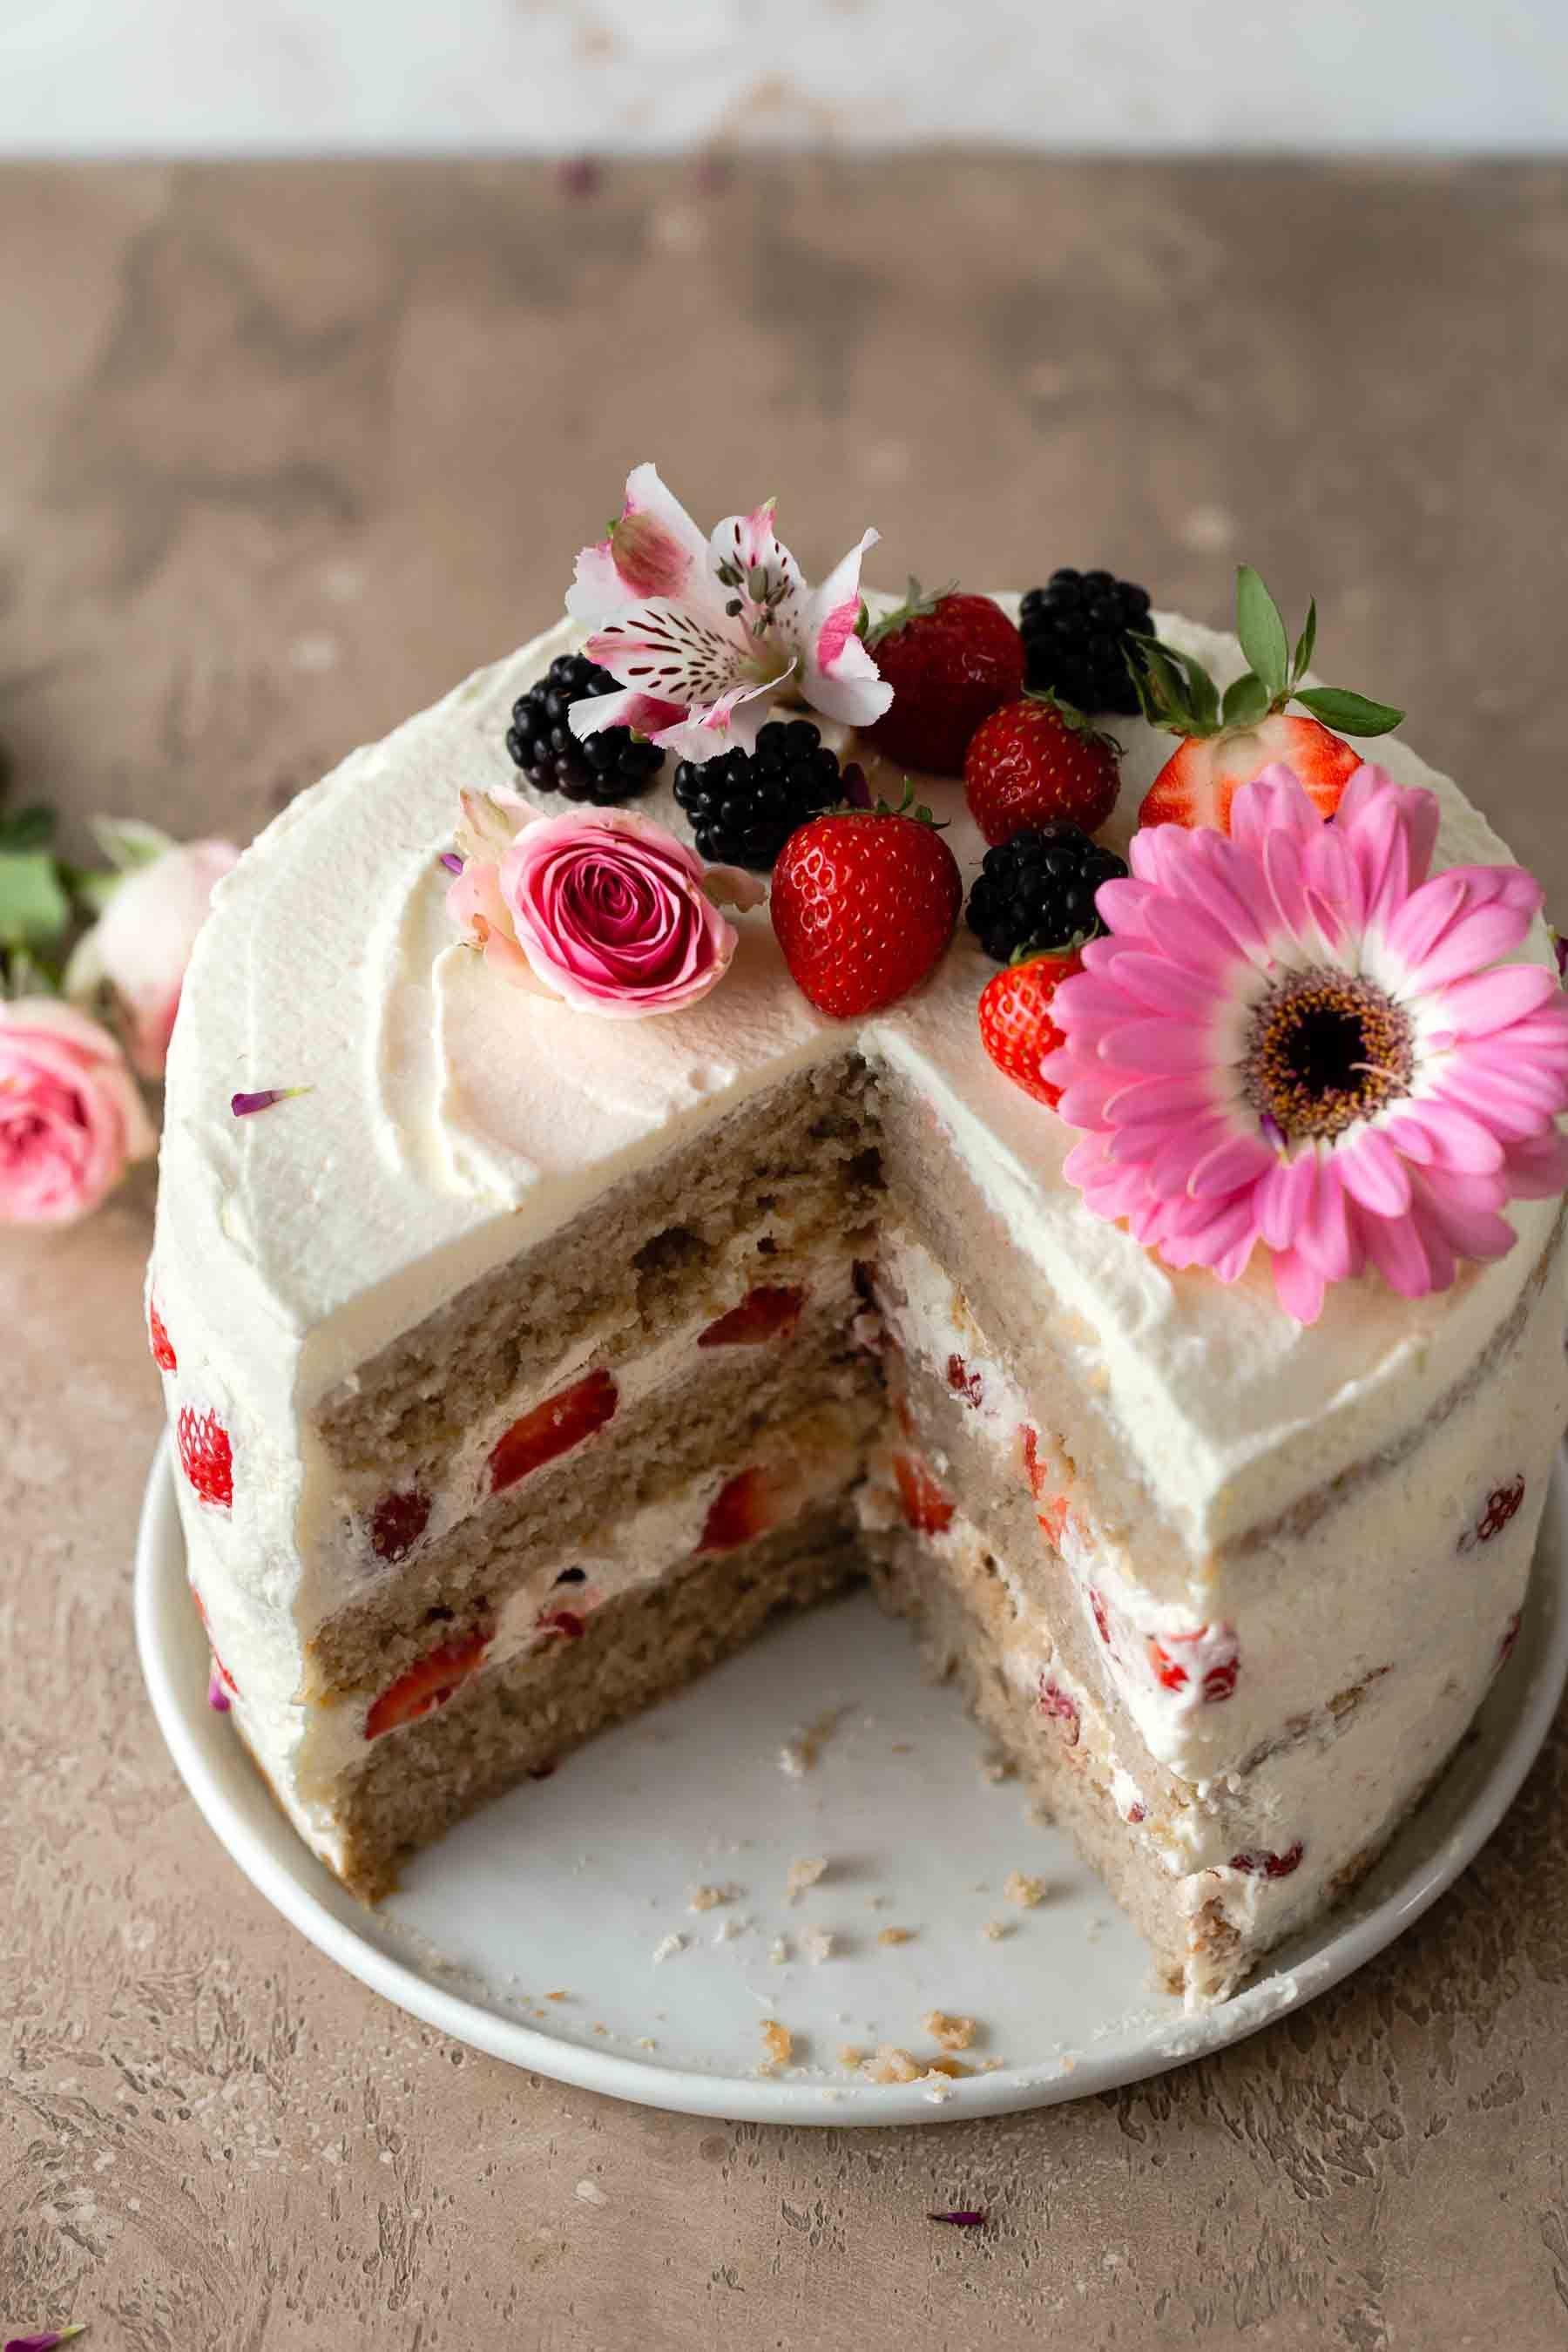 Strawberry Cake Is My Favorite Summer Dessert Strawberry Layer Cake Offers A Stunning Present Homemade Chocolate Fudge Strawberry Cake Recipes Summer Desserts